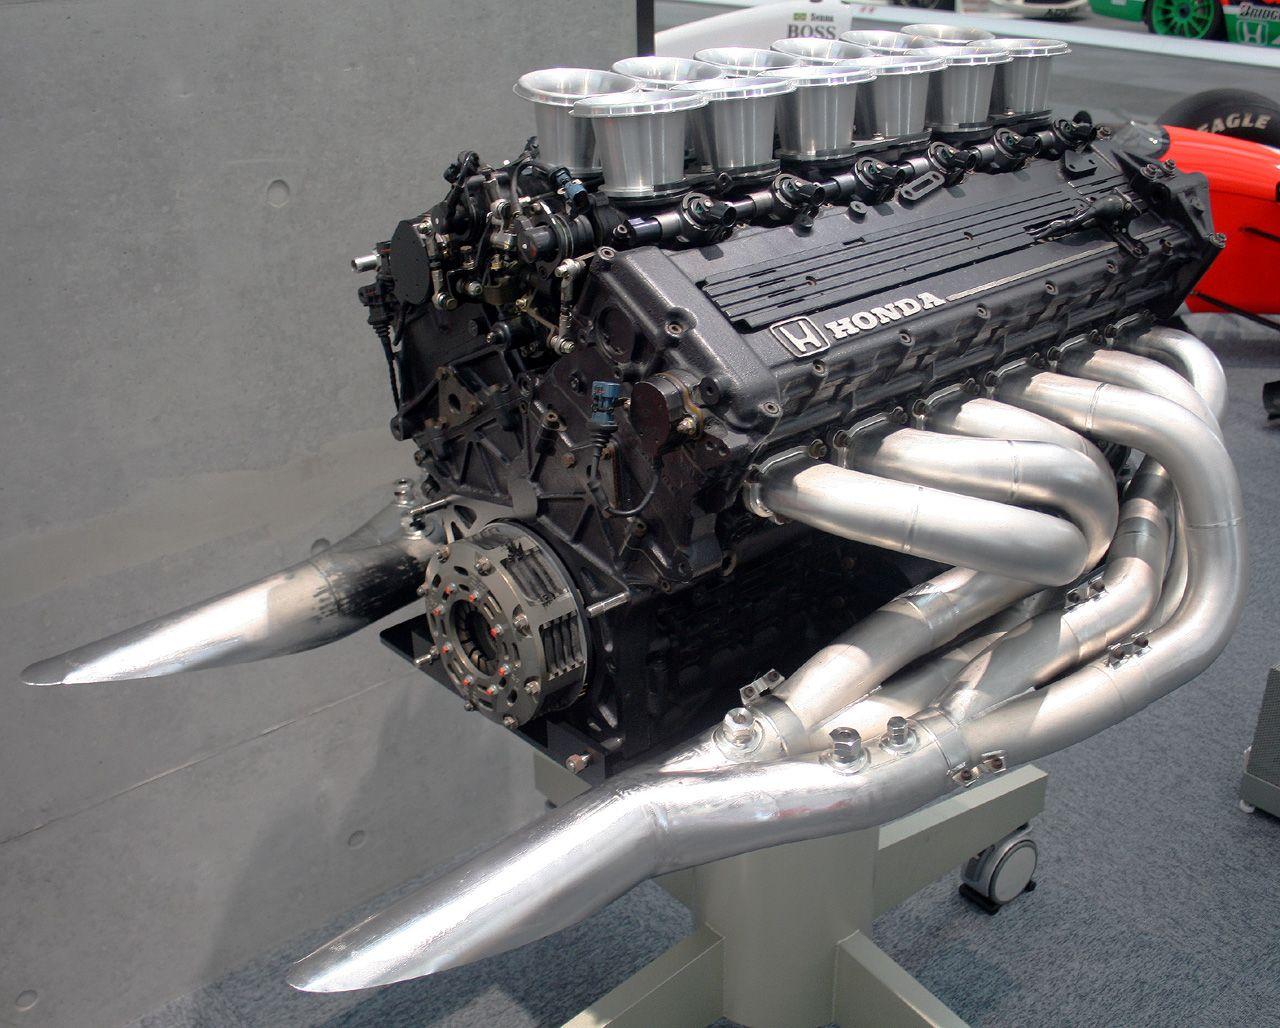 Best 25 honda v6 ideas on pinterest formula 1 engine and nigel mansell